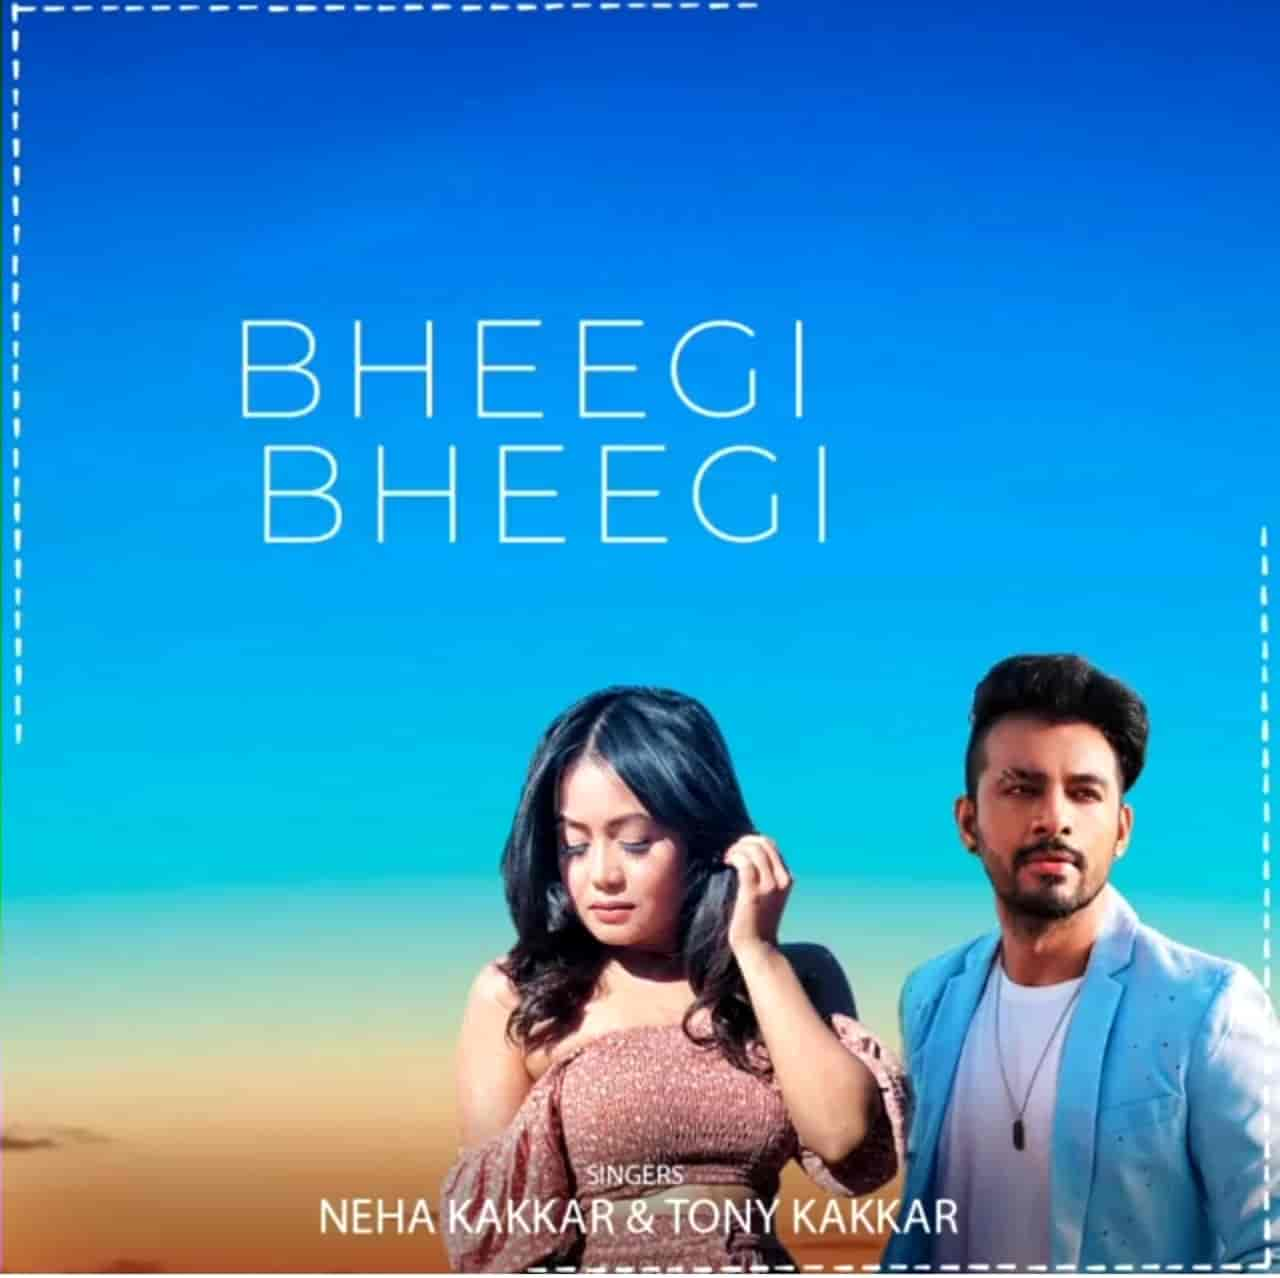 Bheegi Bheegi Song Lyrical Image Features Neha Kakkar, Tony Kakkar